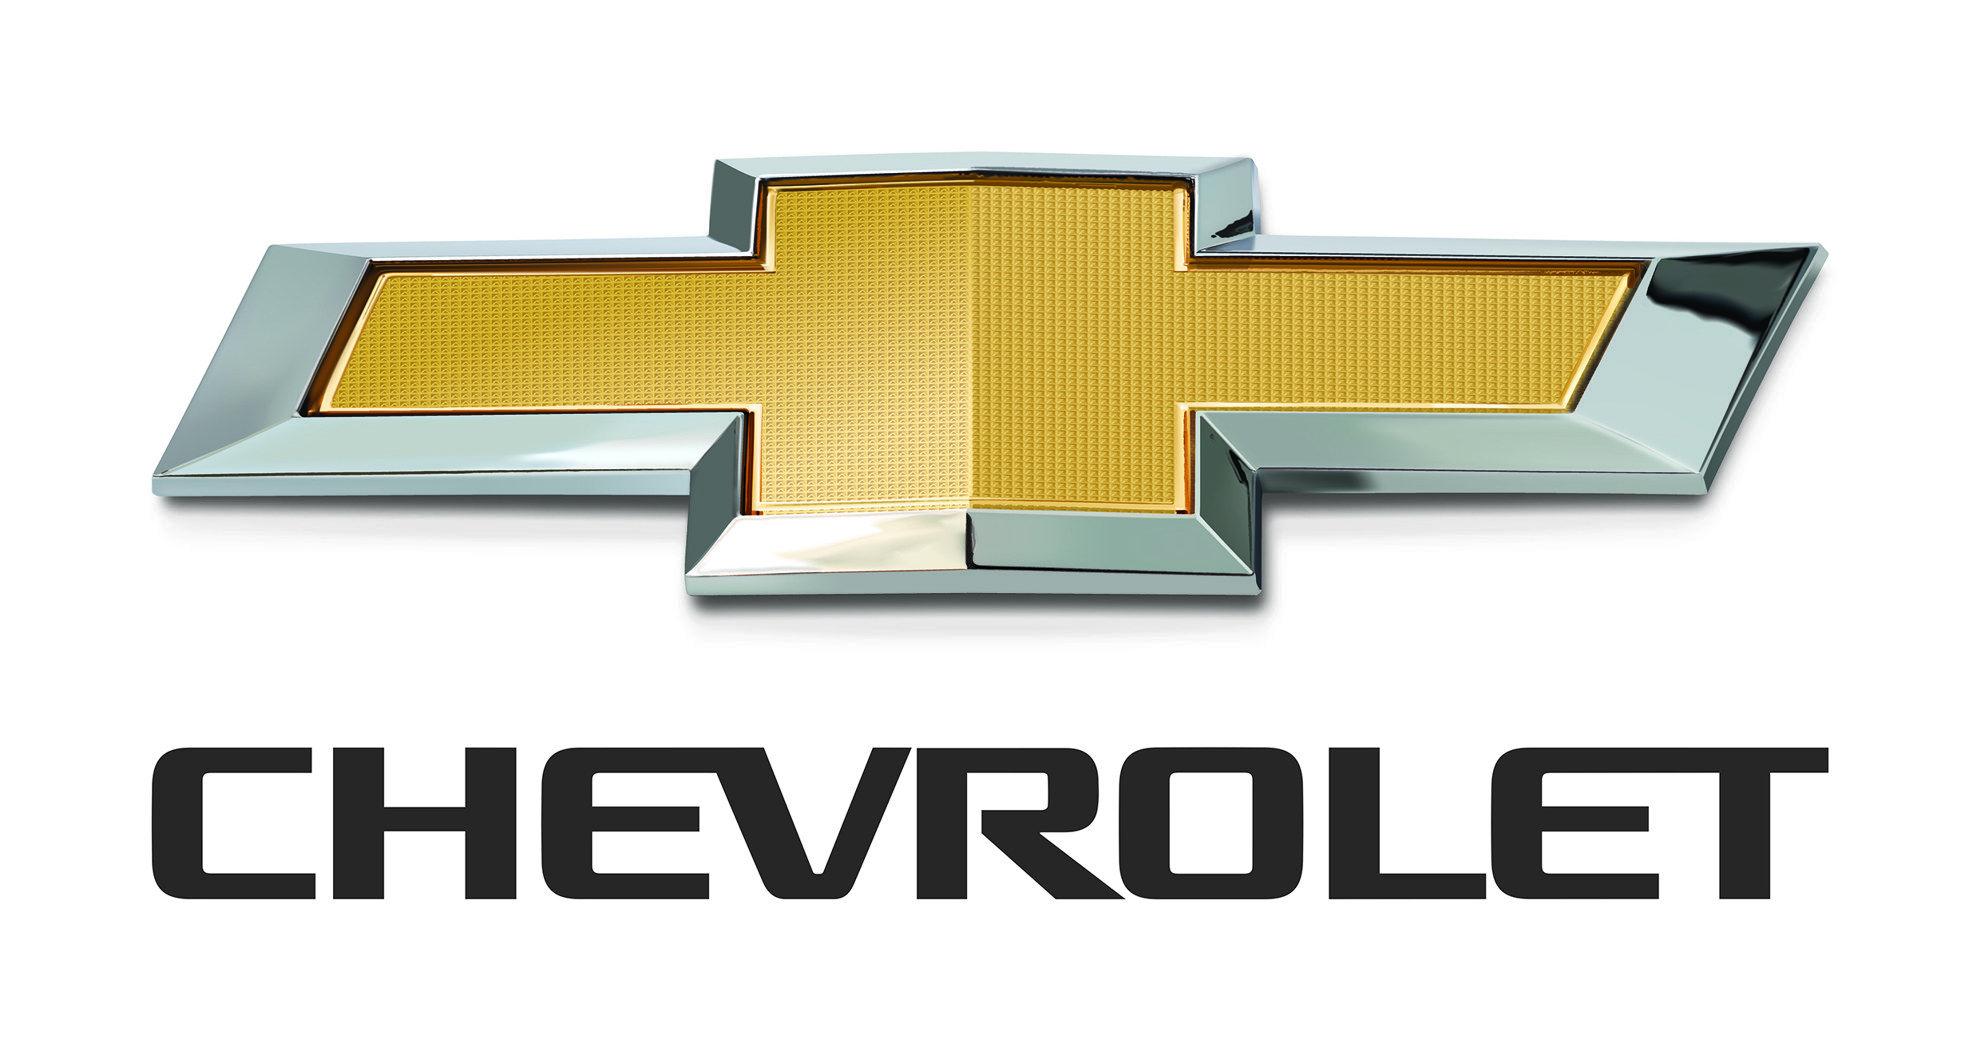 2014 Chevrolet Logo Vector